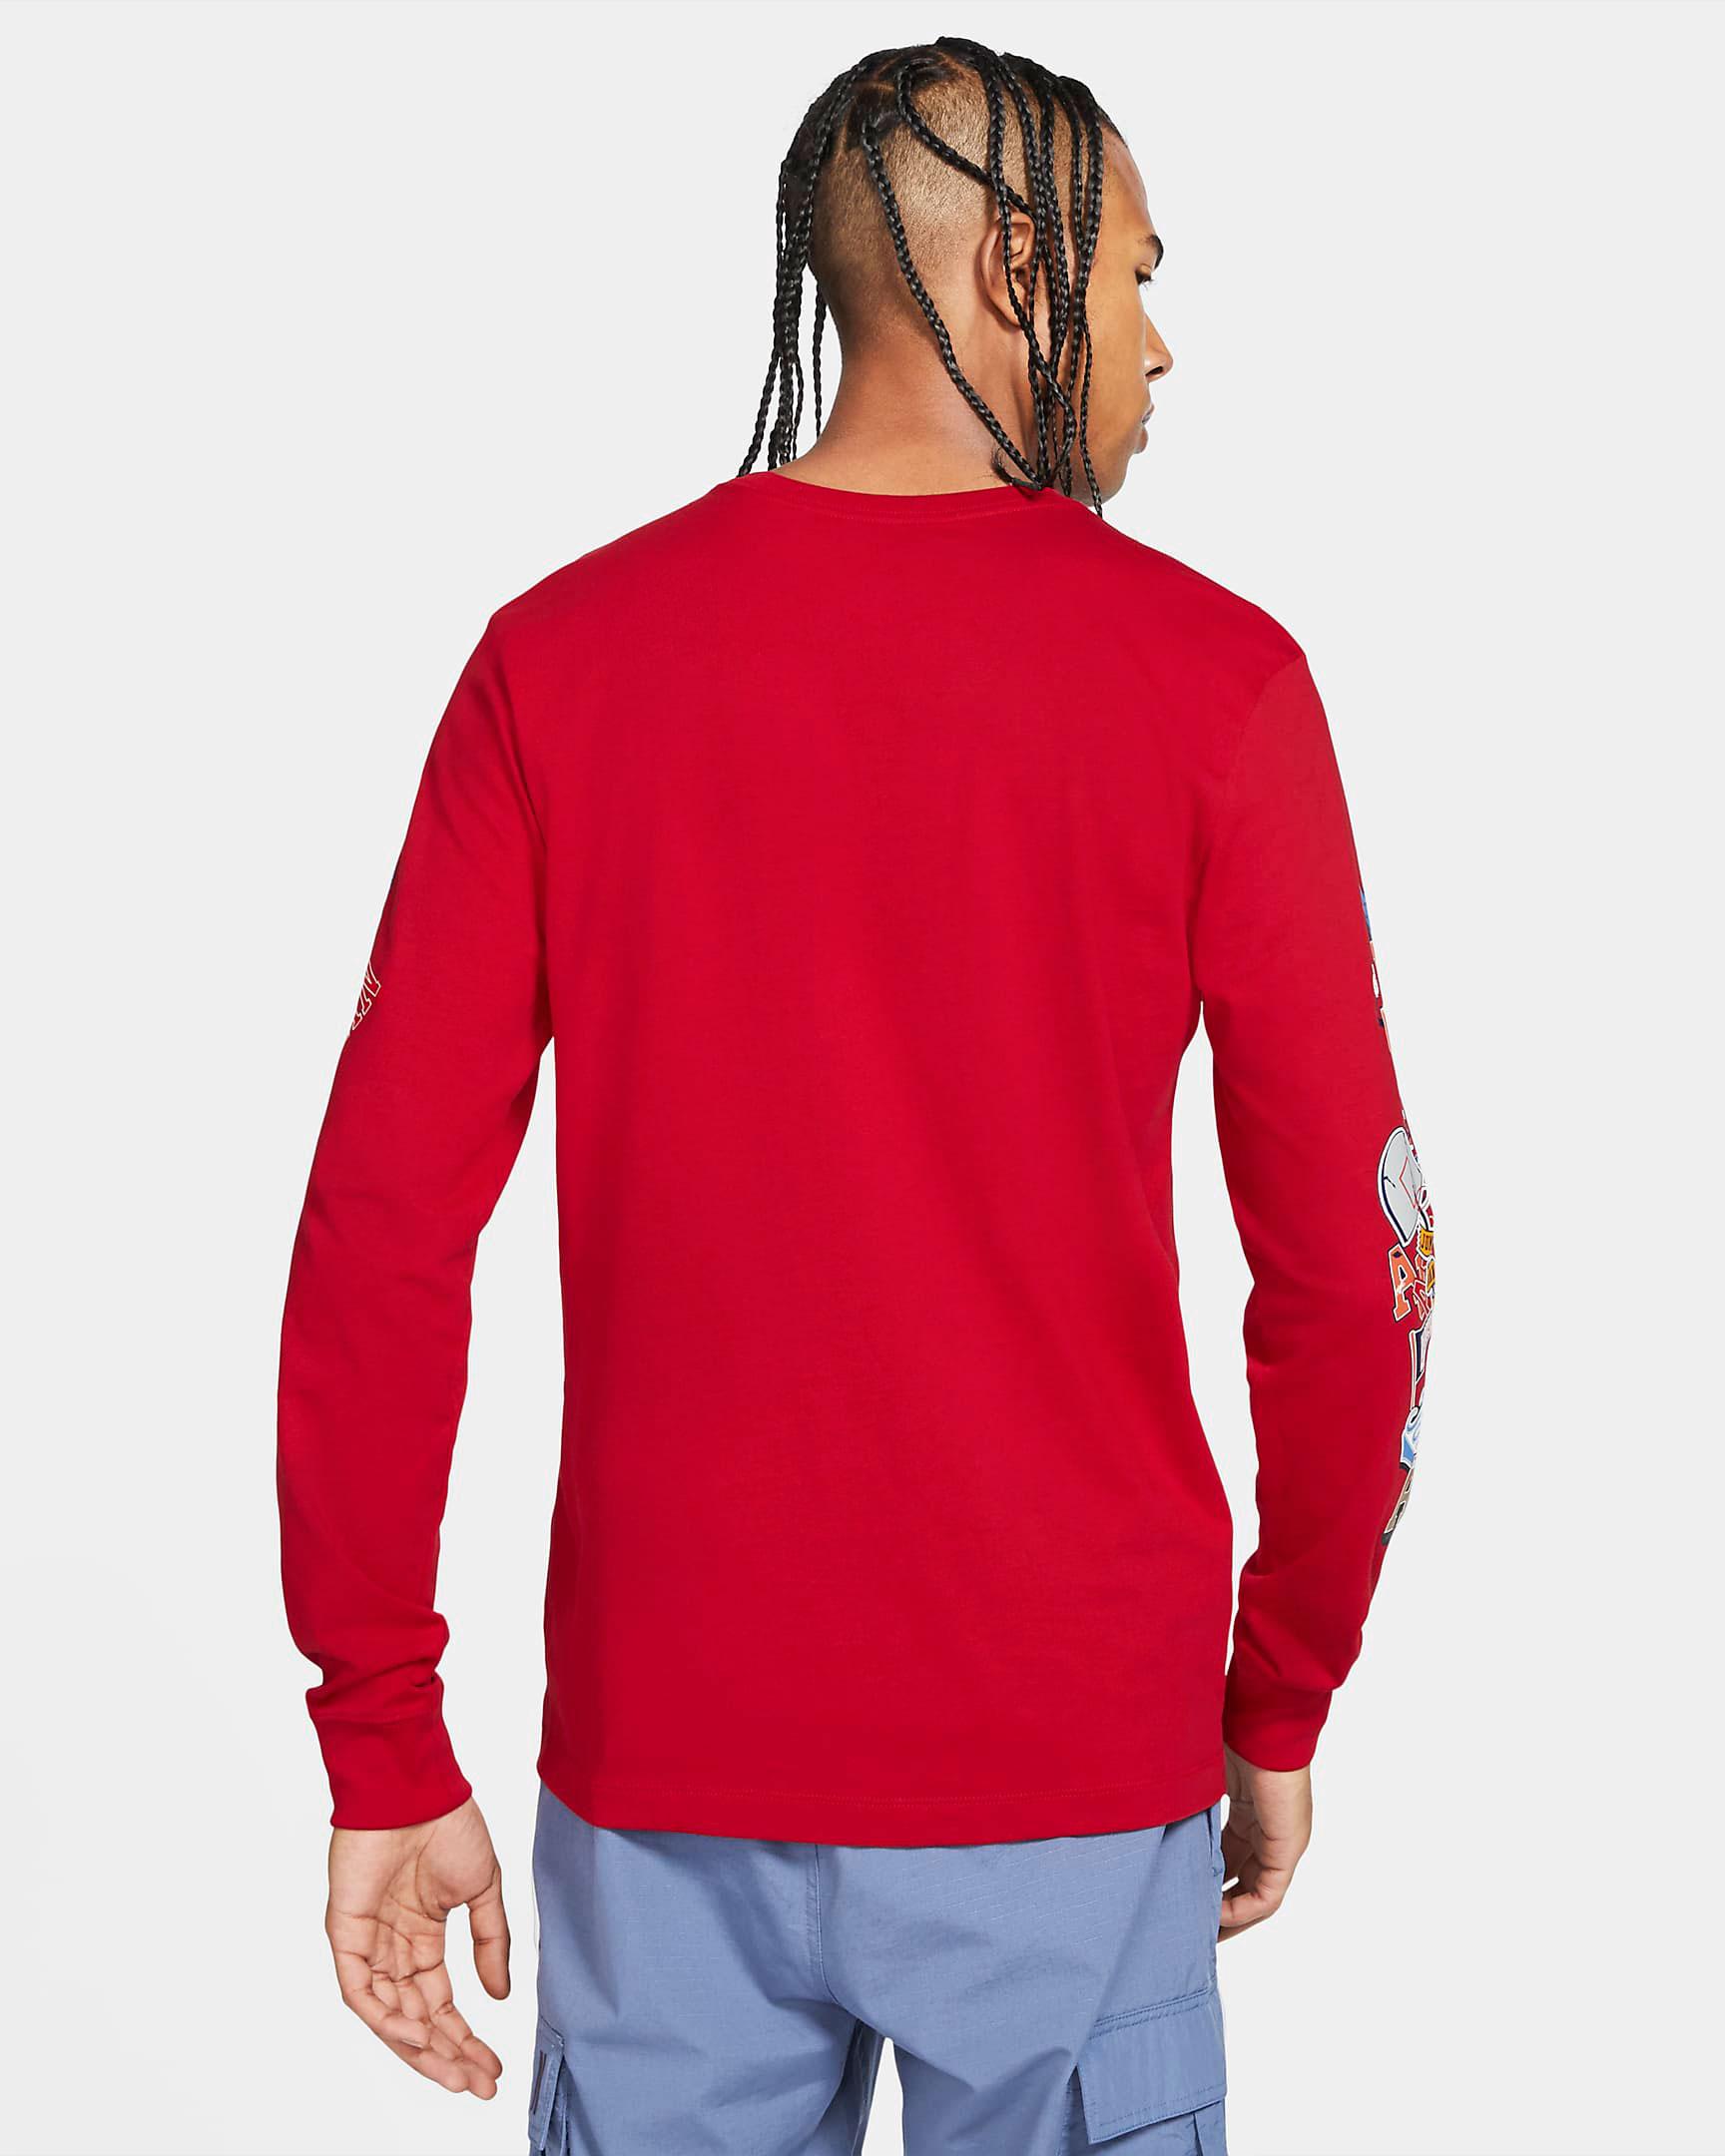 jordan-varsity-long-sleeve-shirt-red-5